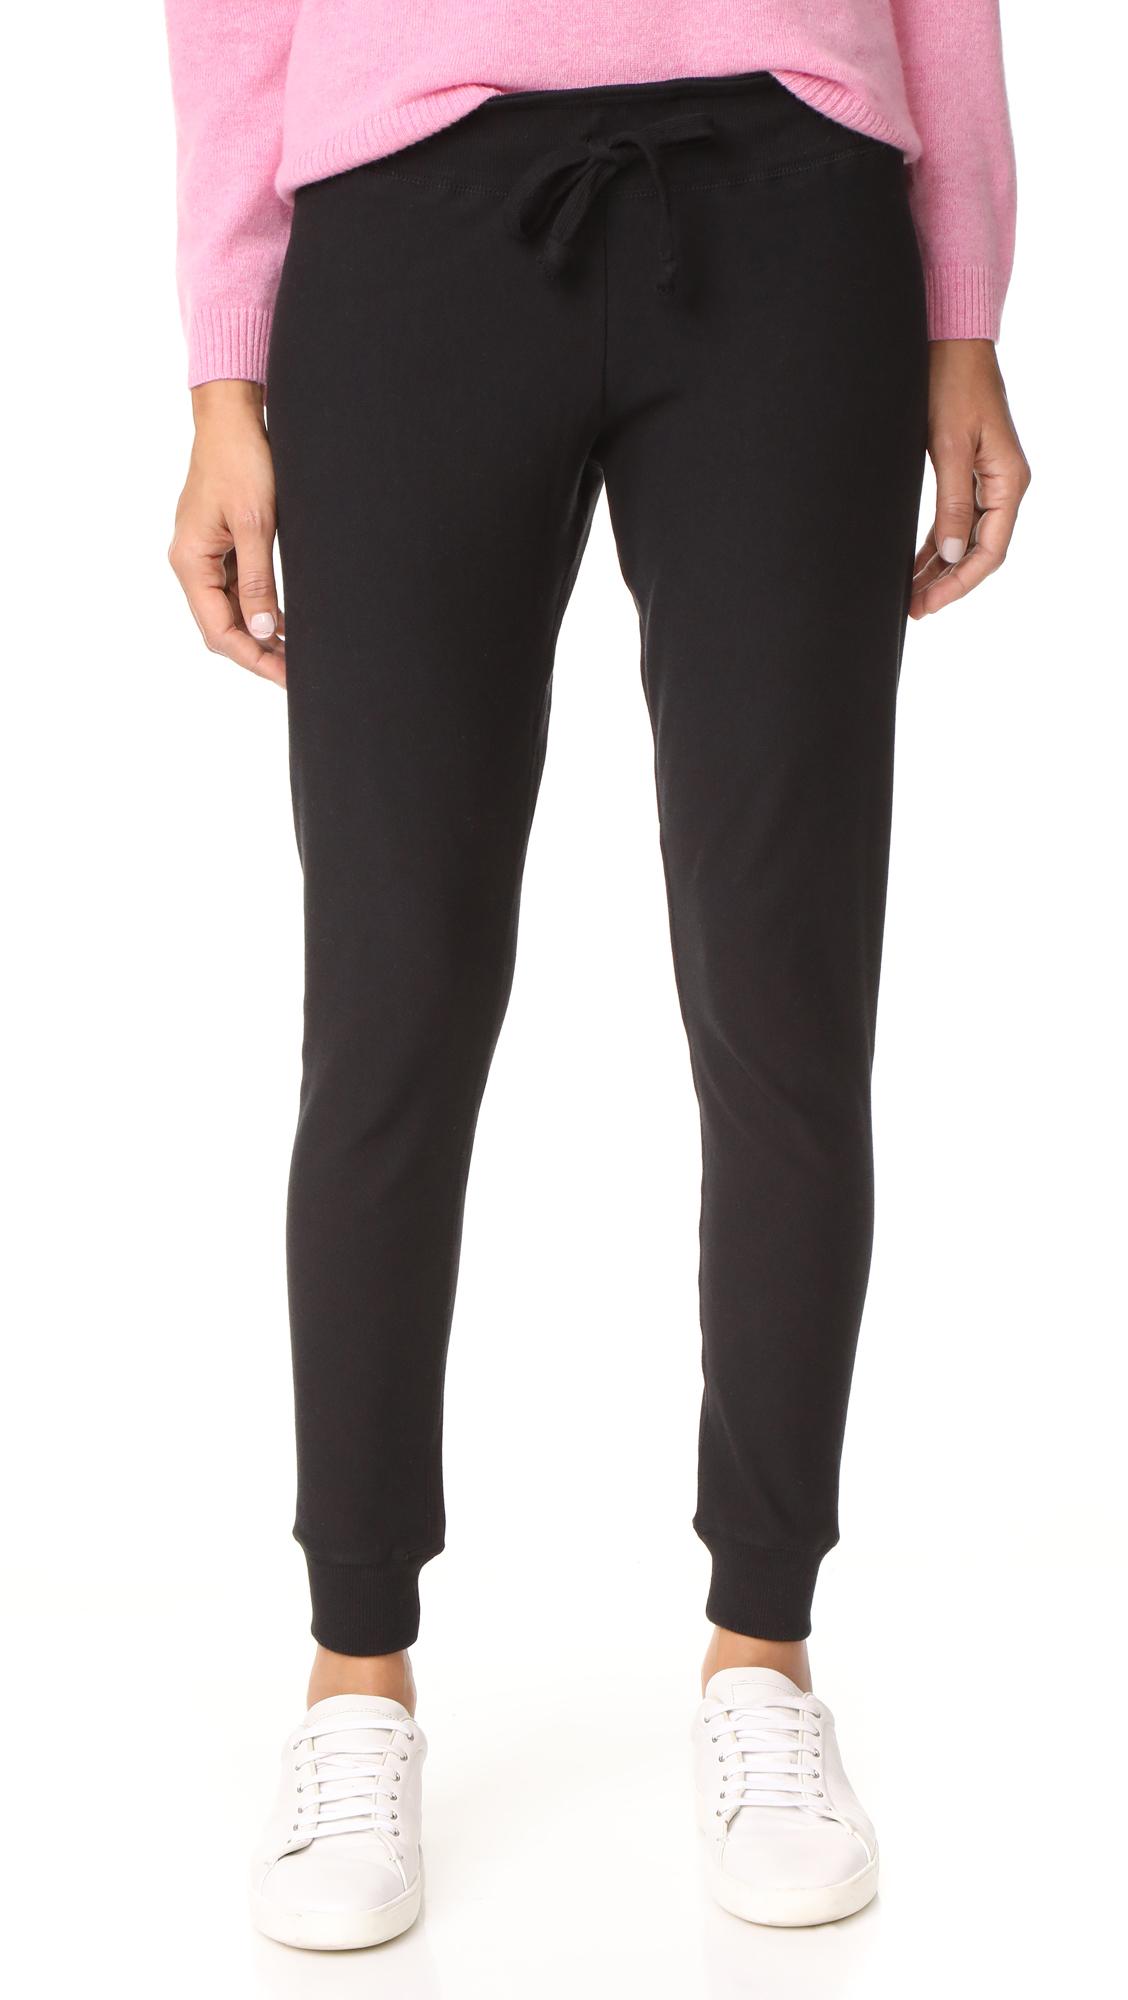 Plush Super Soft Fleece Skinny Sweatpants